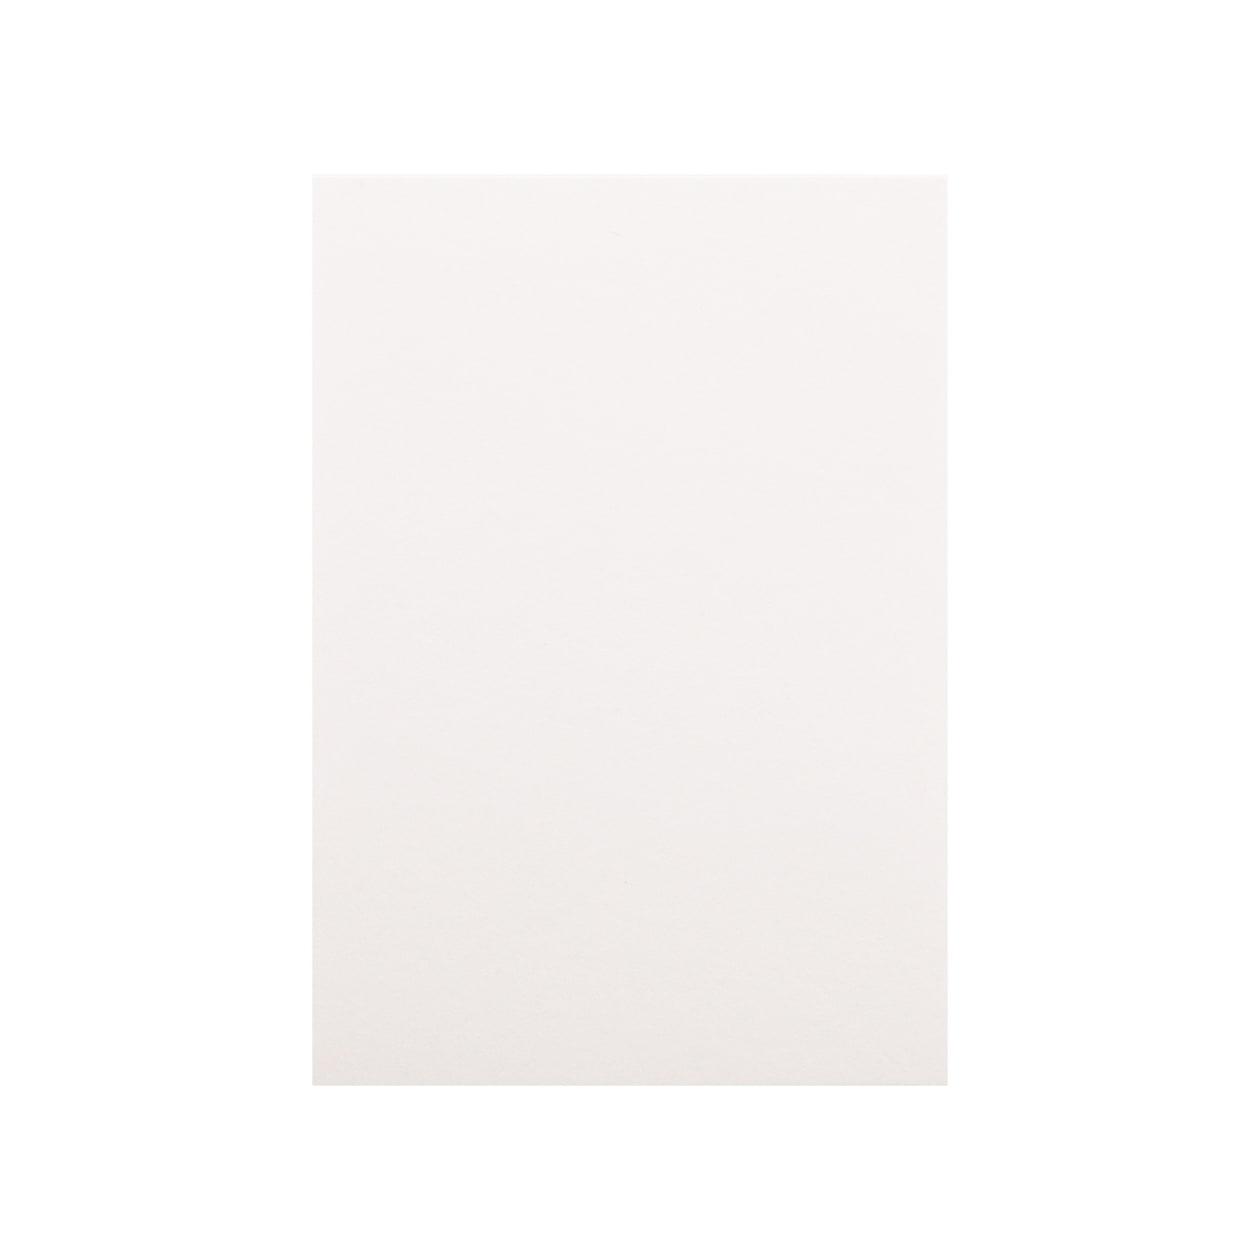 Pカード HAGURUMA Basic プレインホワイト 200g